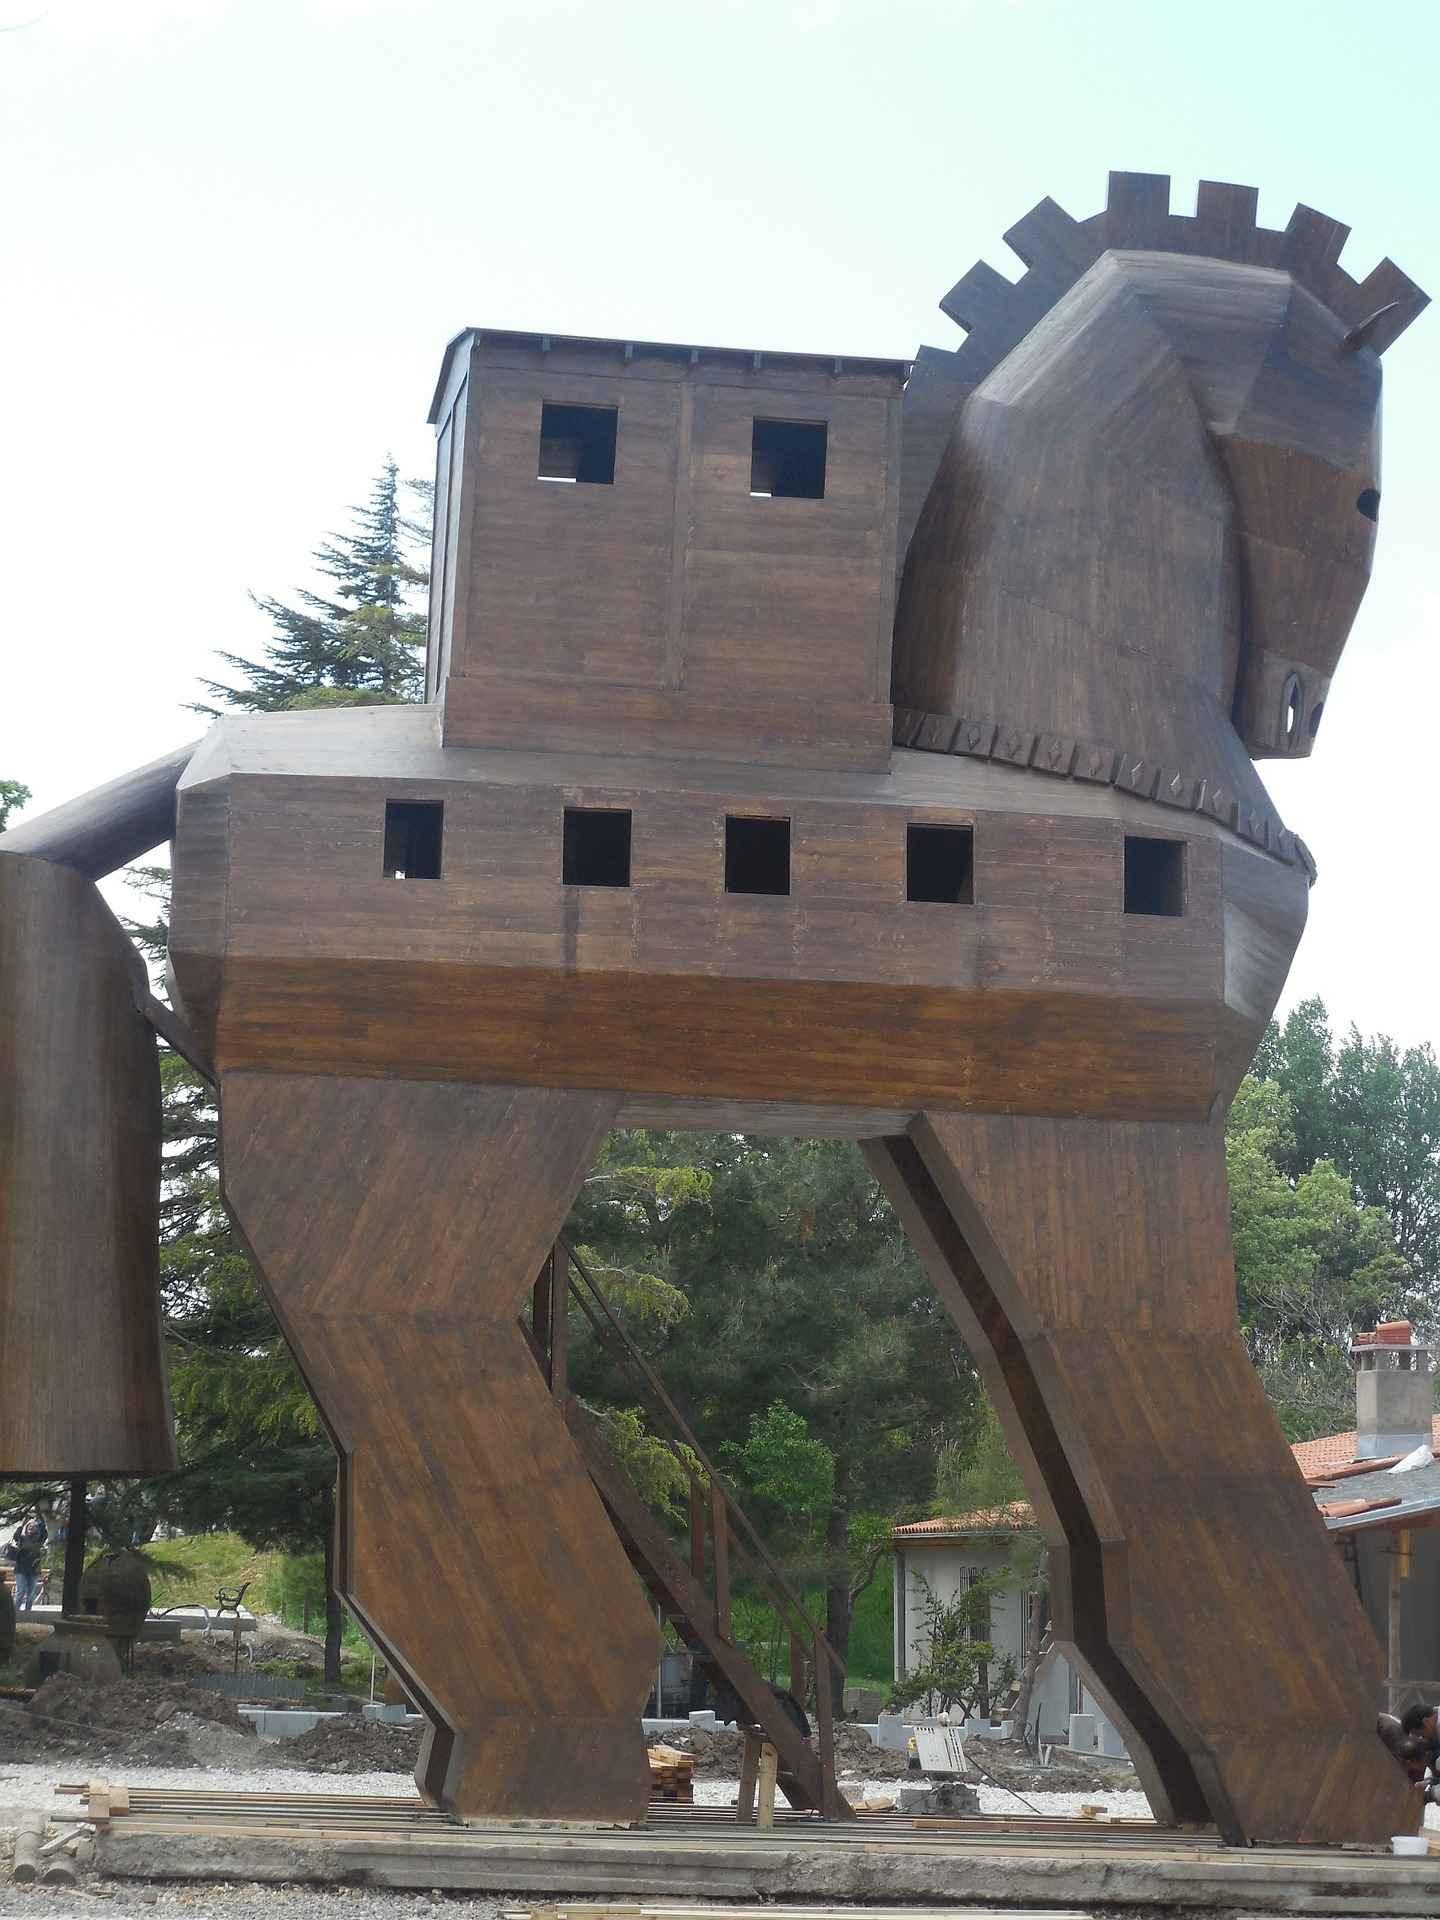 trojan-horse-277525_1920